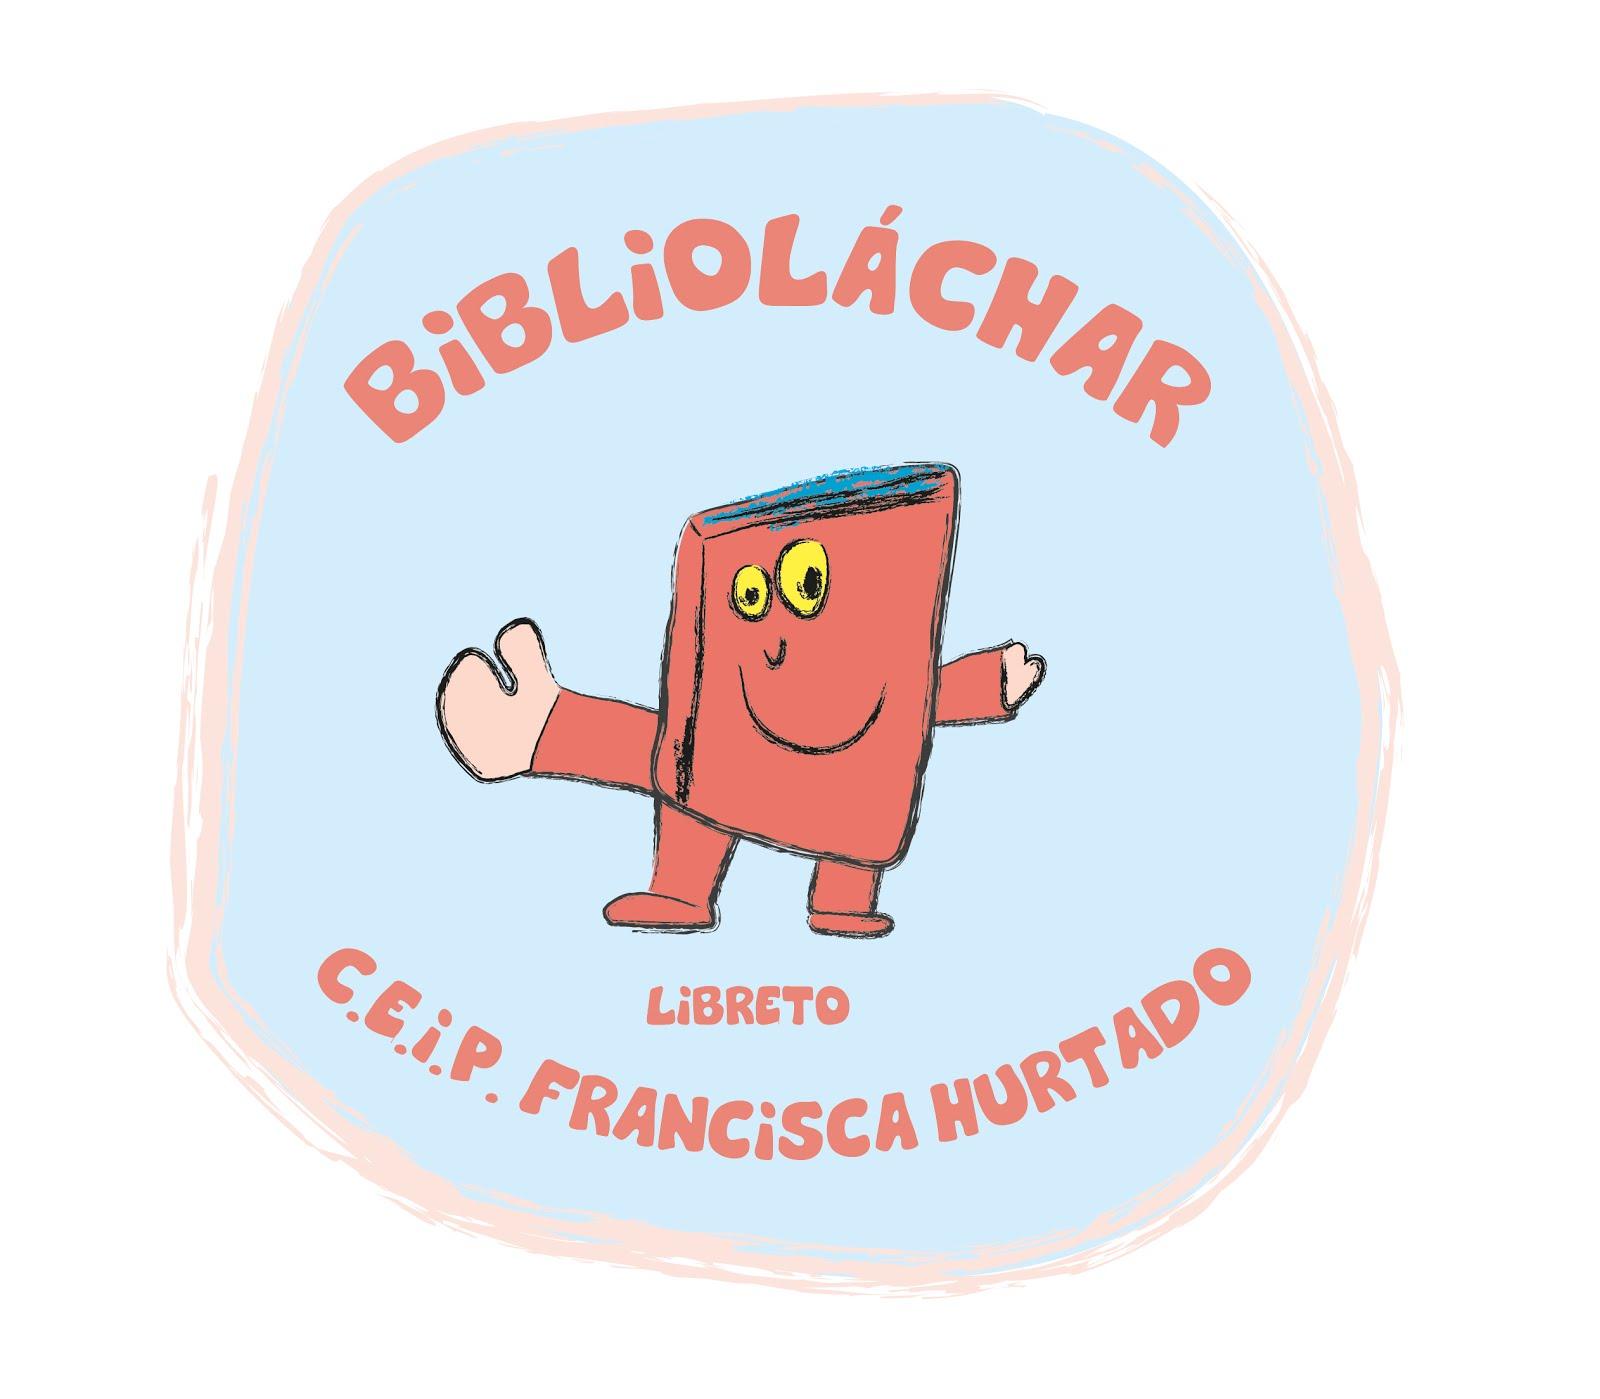 BiblioLáchar